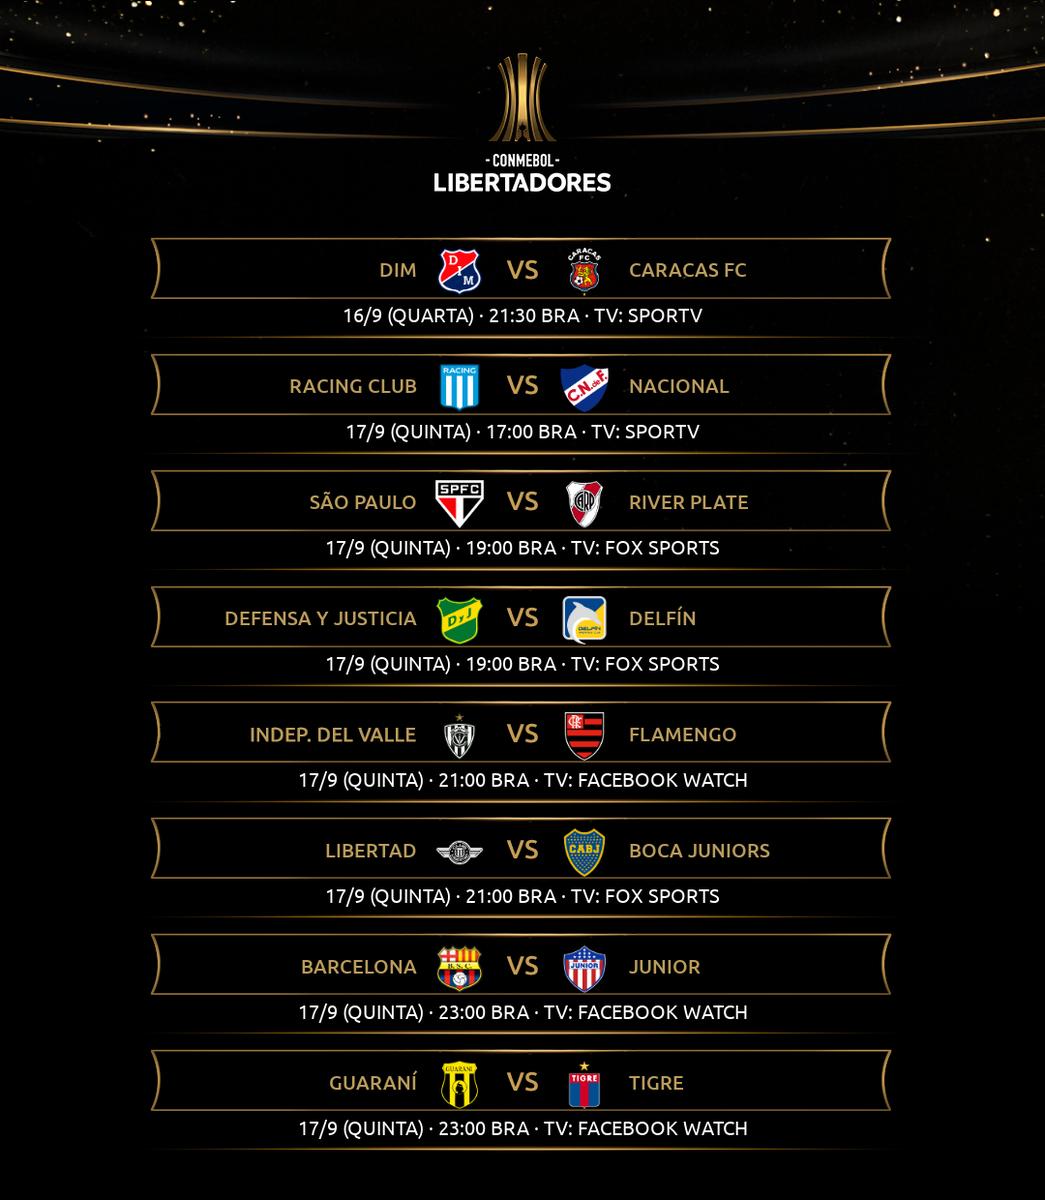 Conmebol Libertadores On Twitter A Tabela Da Quarta Rodada Da Fase De Grupos Da Libertadores Confira As Datas E Jogos Dos Clubes Que Lutam Pela Gloriaeterna Https T Co Qm1vhbbgf2